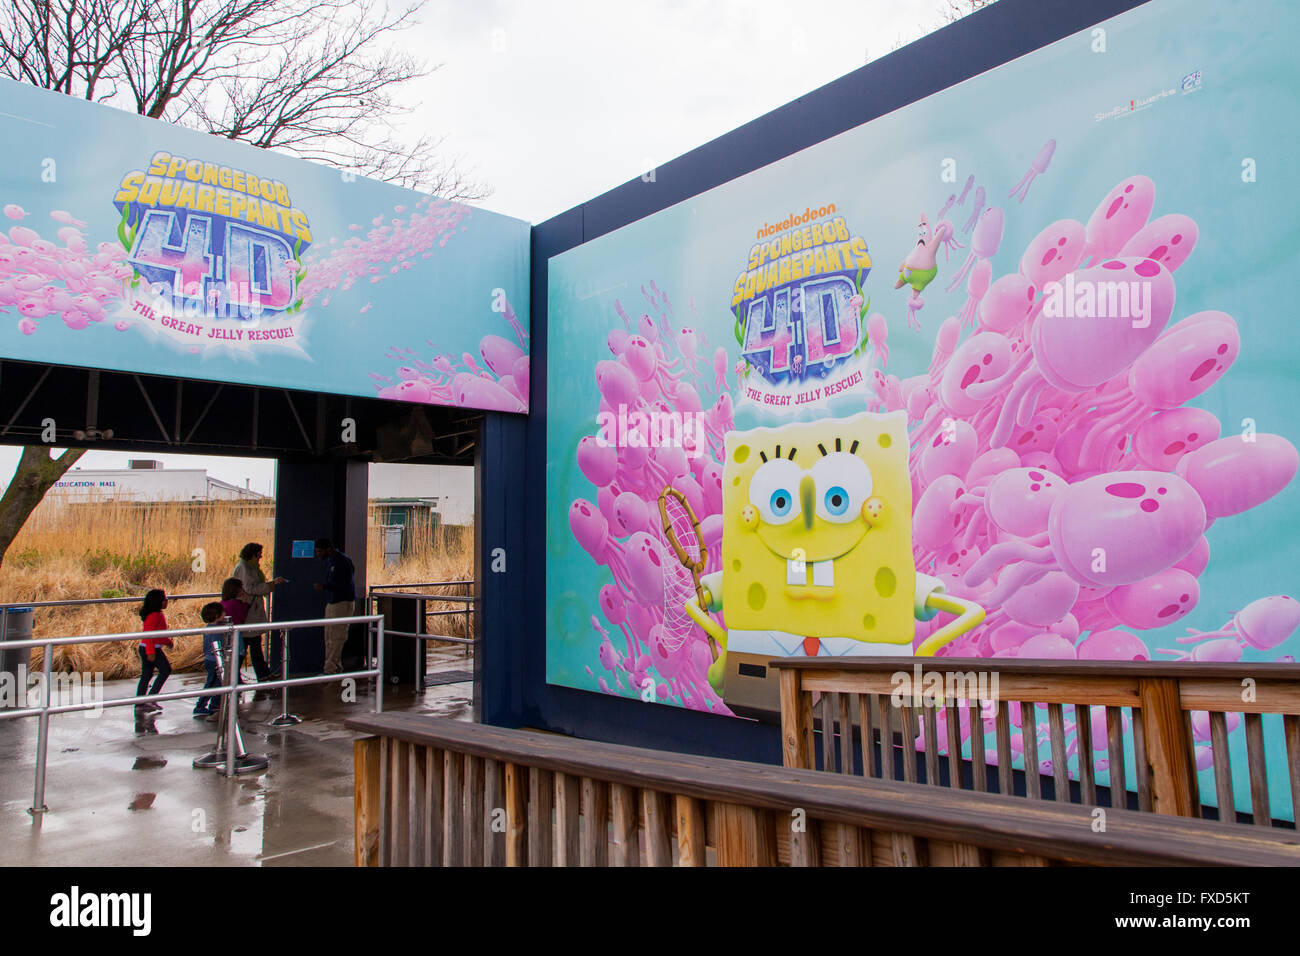 4d Cinema At The New York Aquarium Coney Island Brooklyn New York